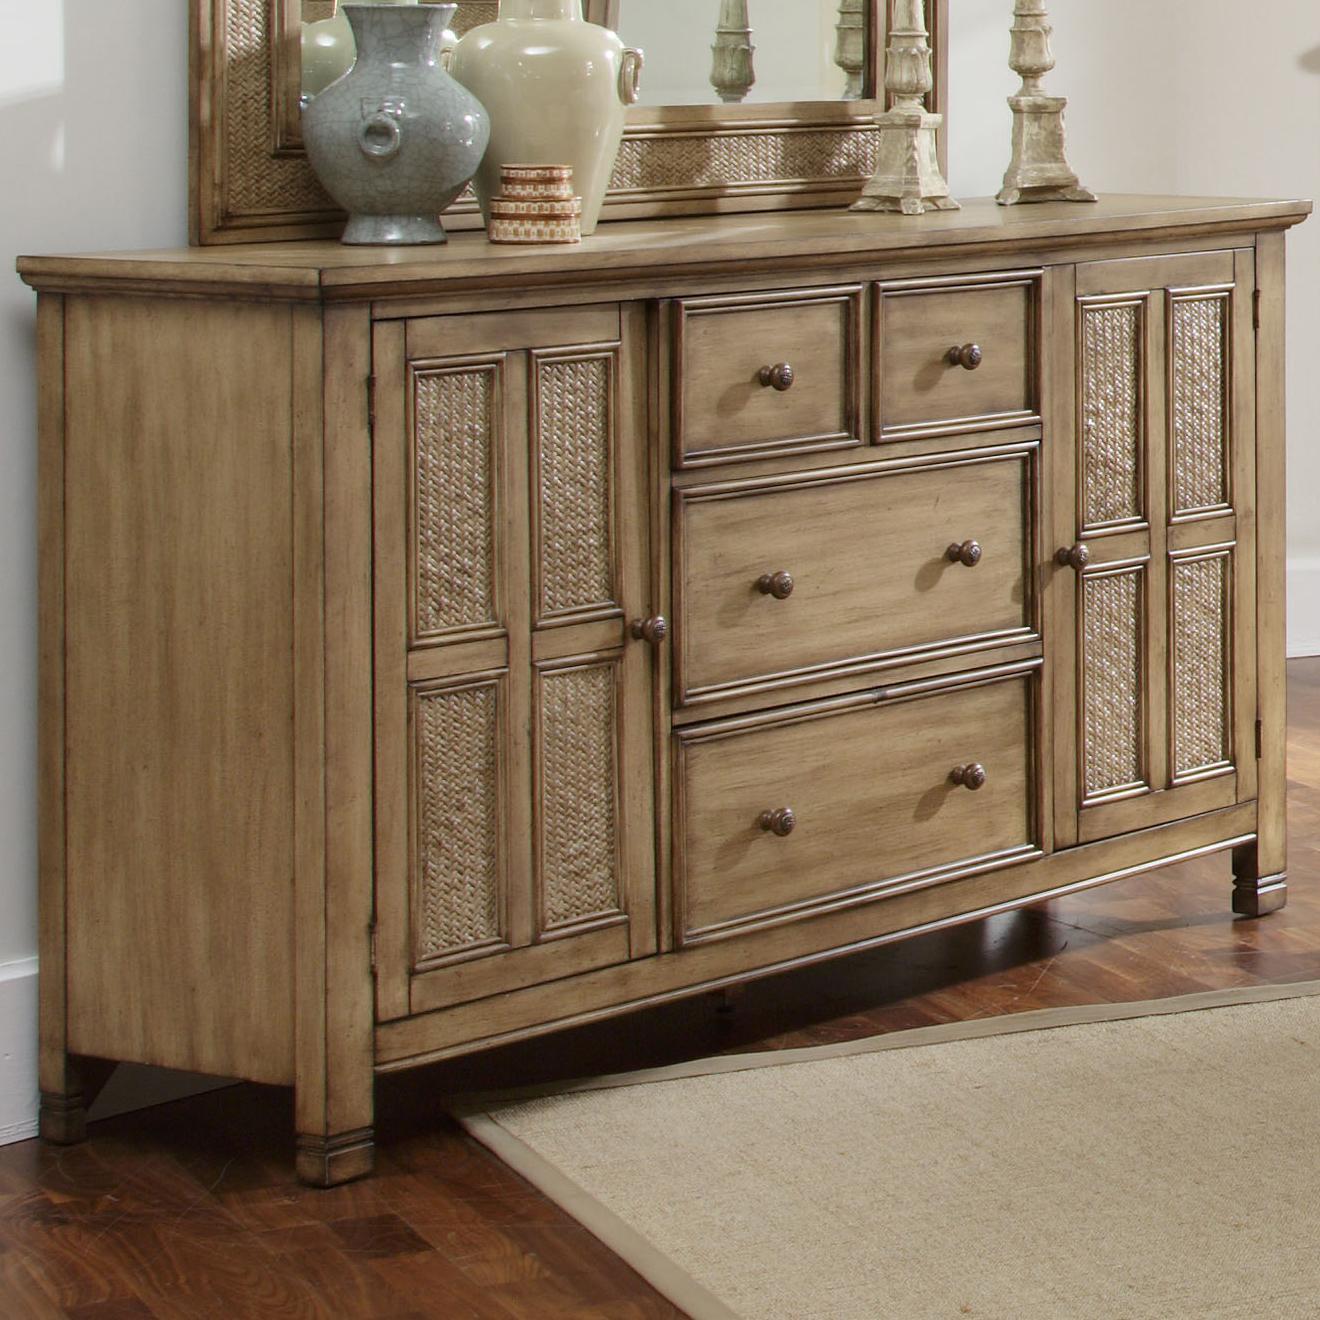 Progressive furniture kingston isle p196 24 2 door dresser for Furniture kingston